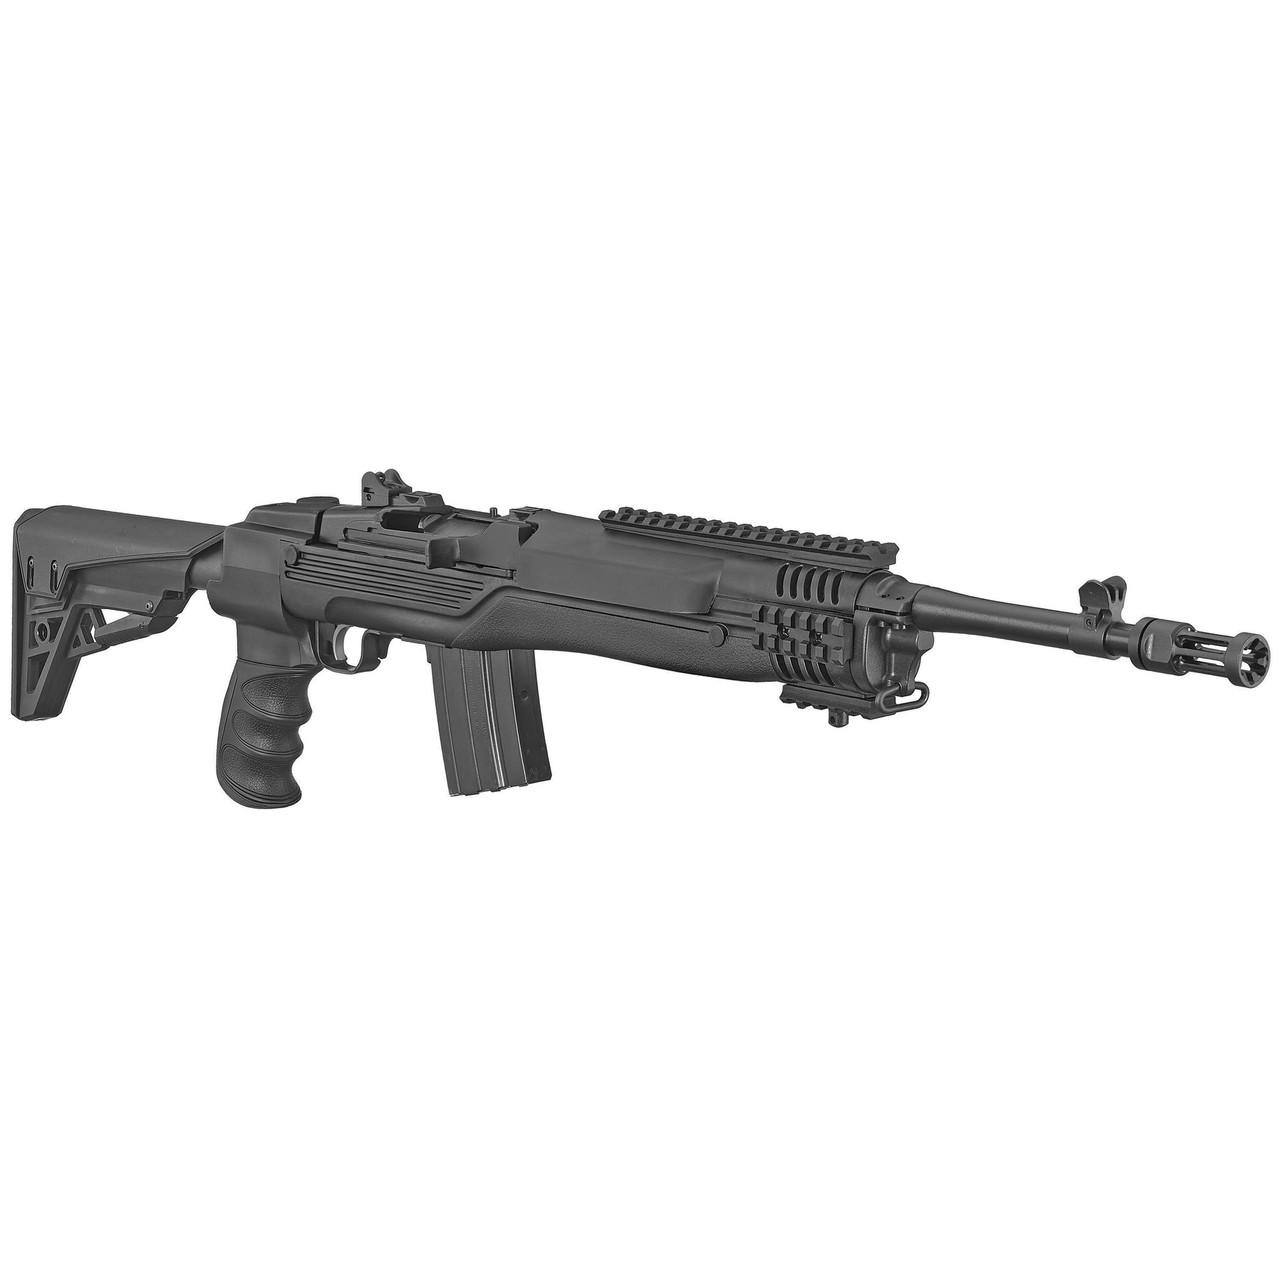 Ruger Mini-14 Tactical Featureless CALIFORNIA LEGAL - .223/5.56